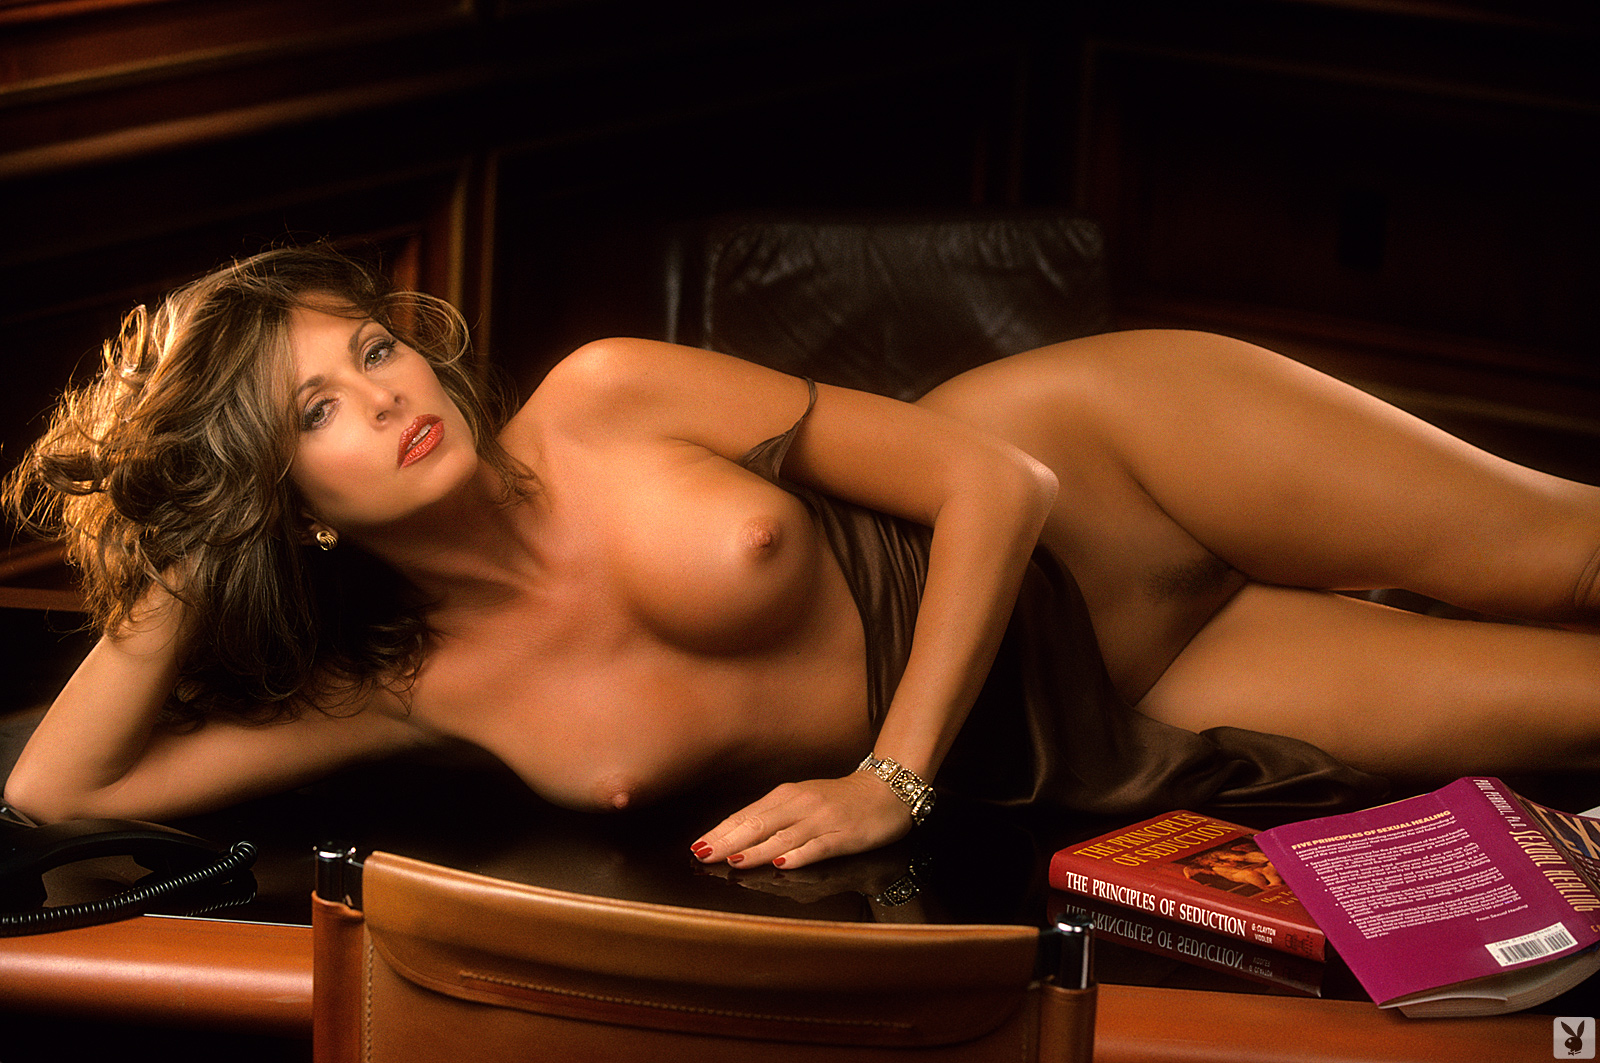 Threesome barbara bosson boobs filled porn